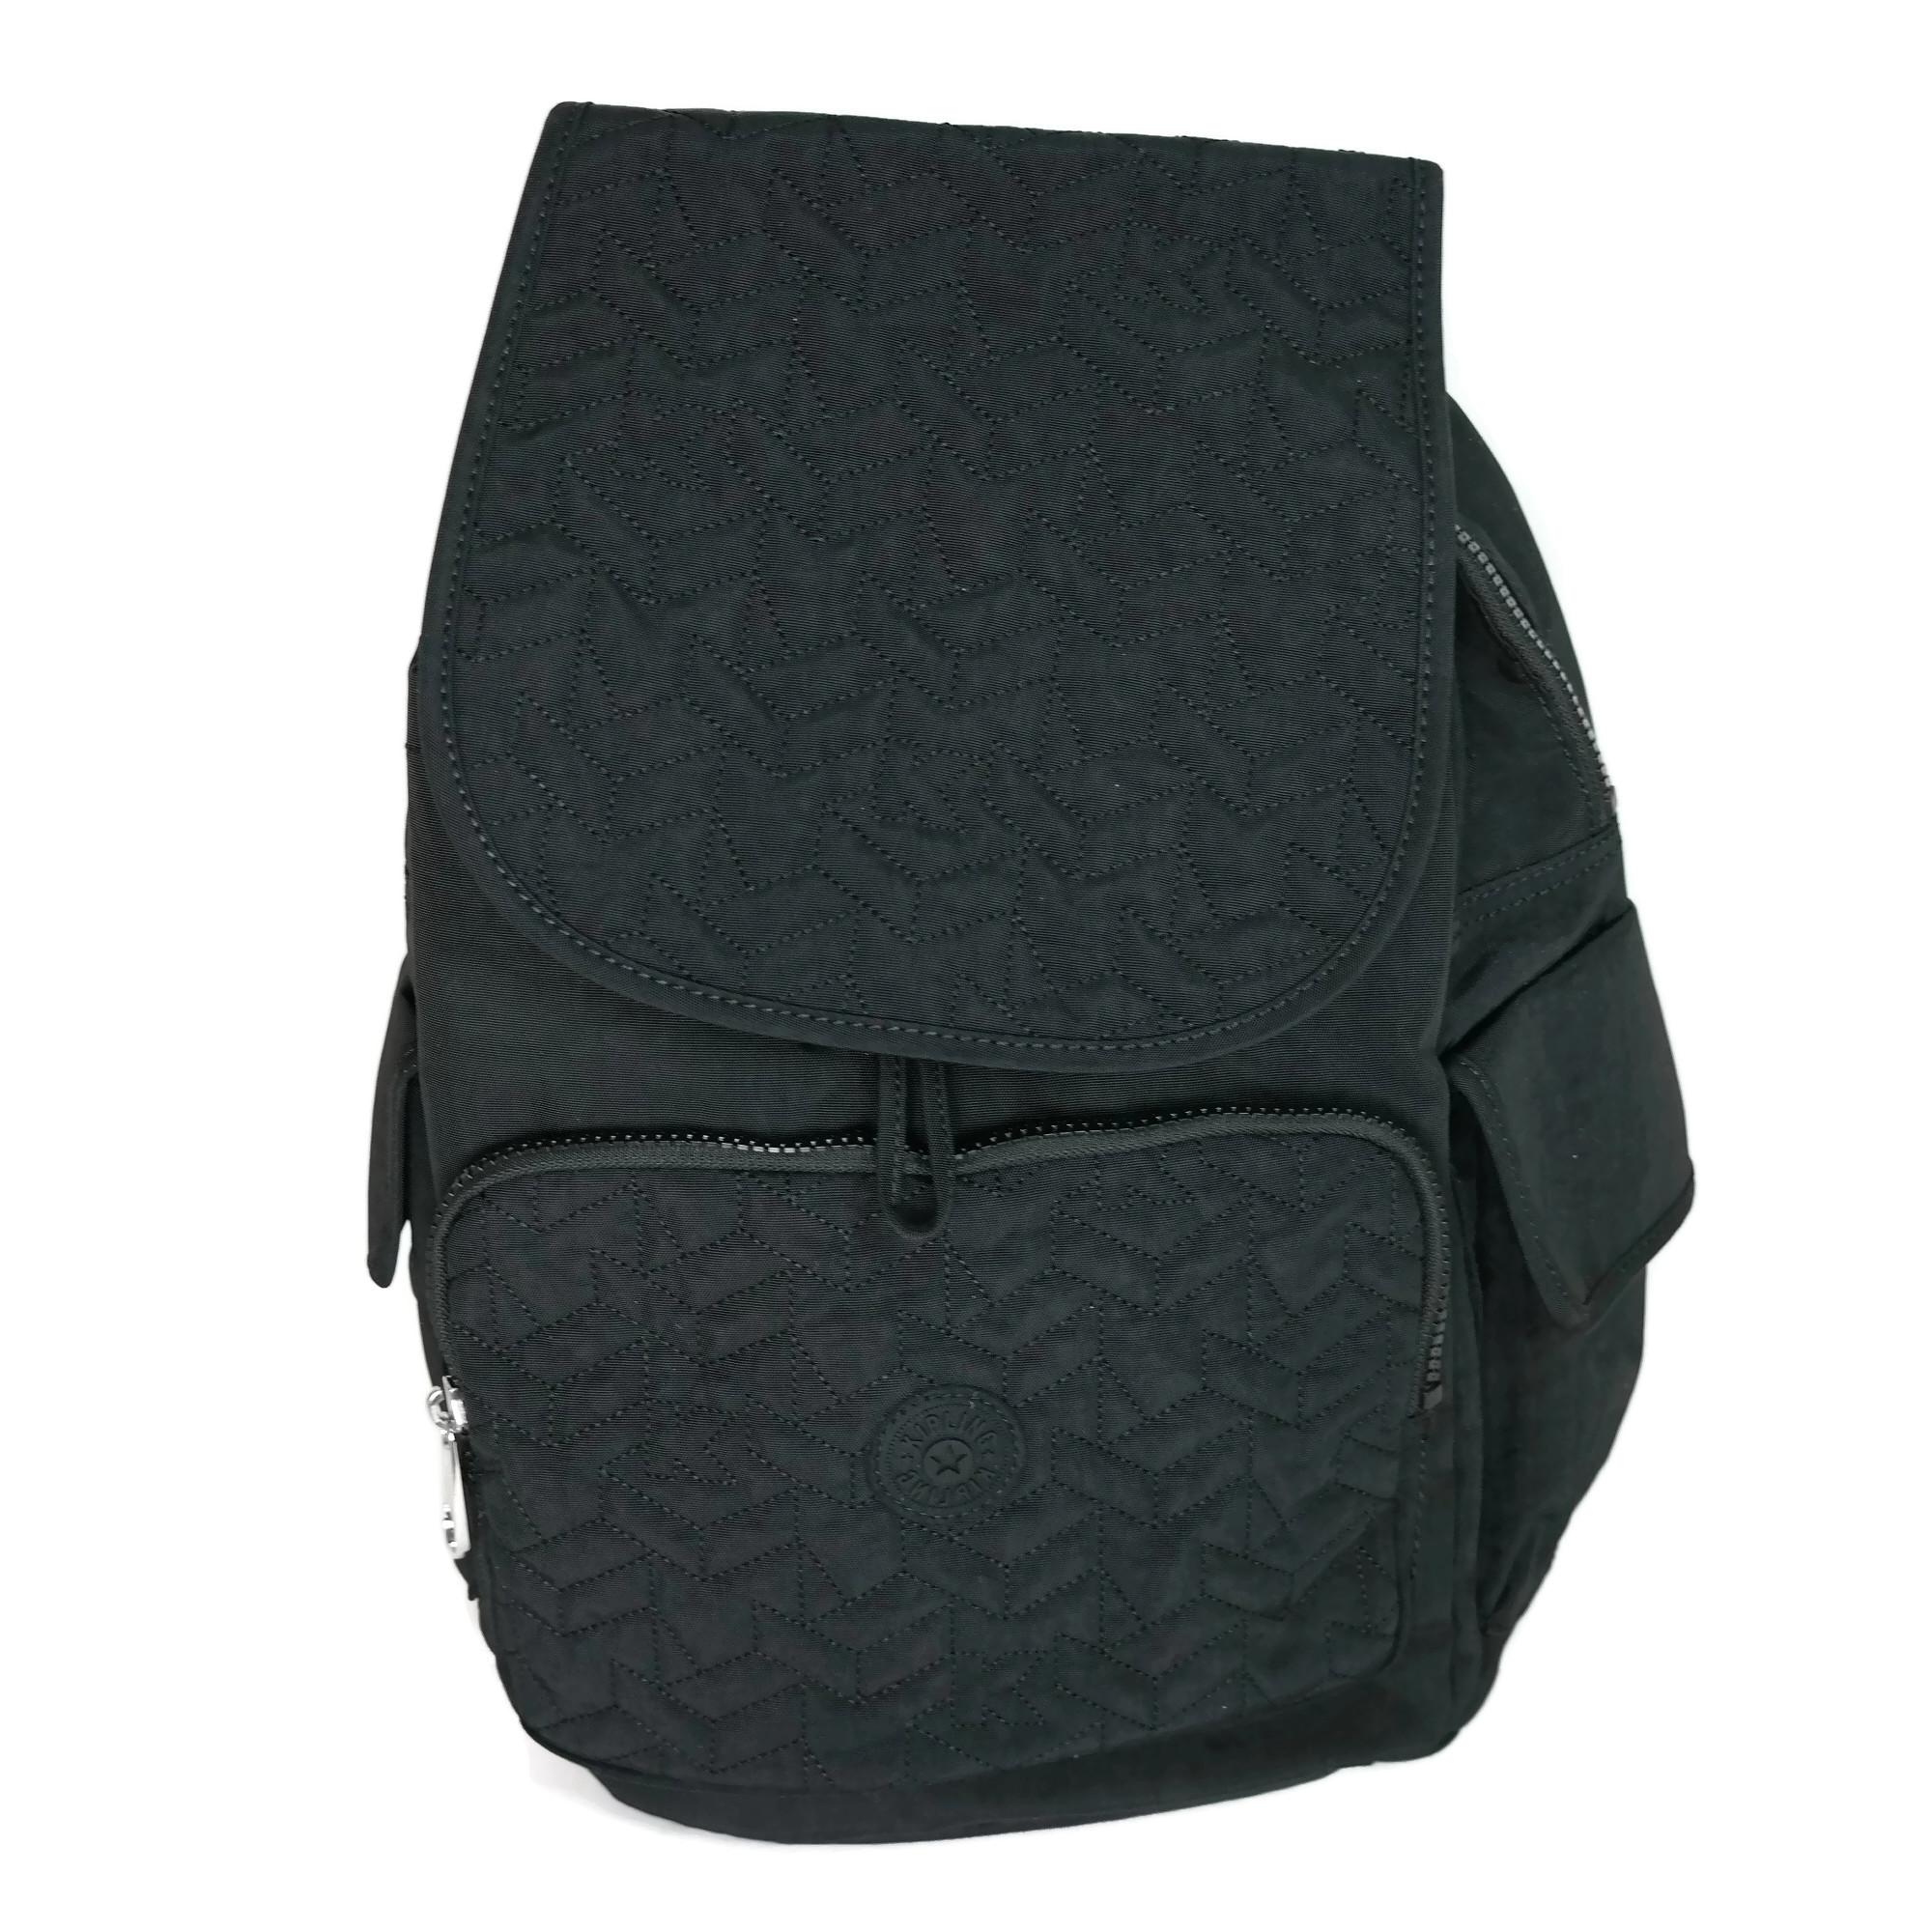 6073f543a Details about Kipling Women's Ravier Medium Backpack One Size, Black, BP4072